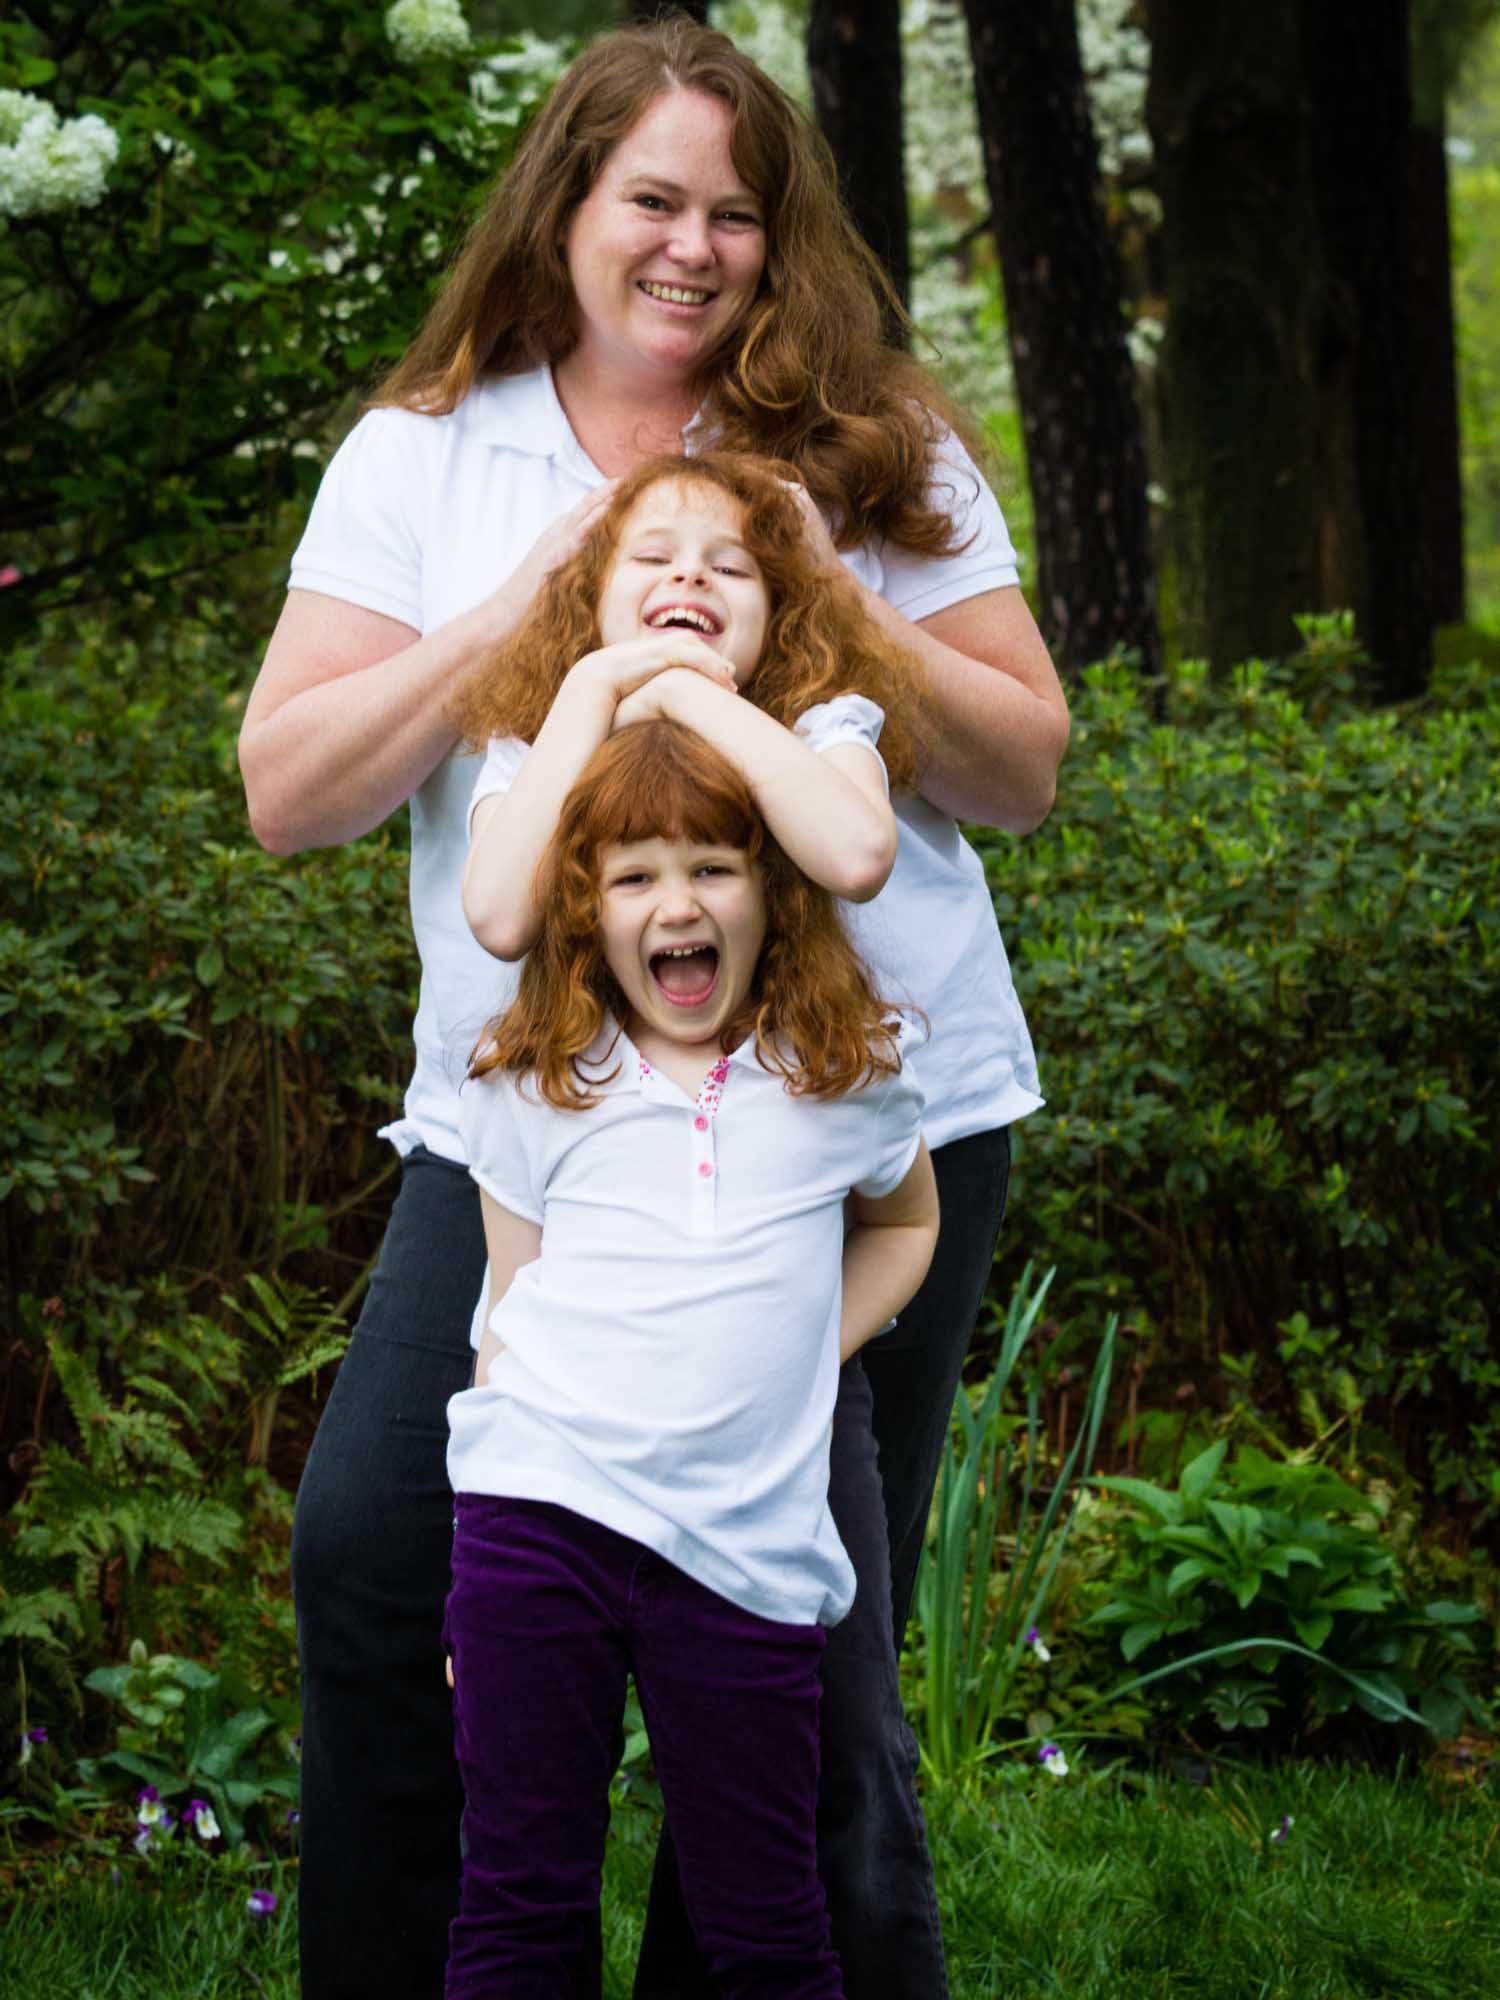 205-Underwood Family.jpg